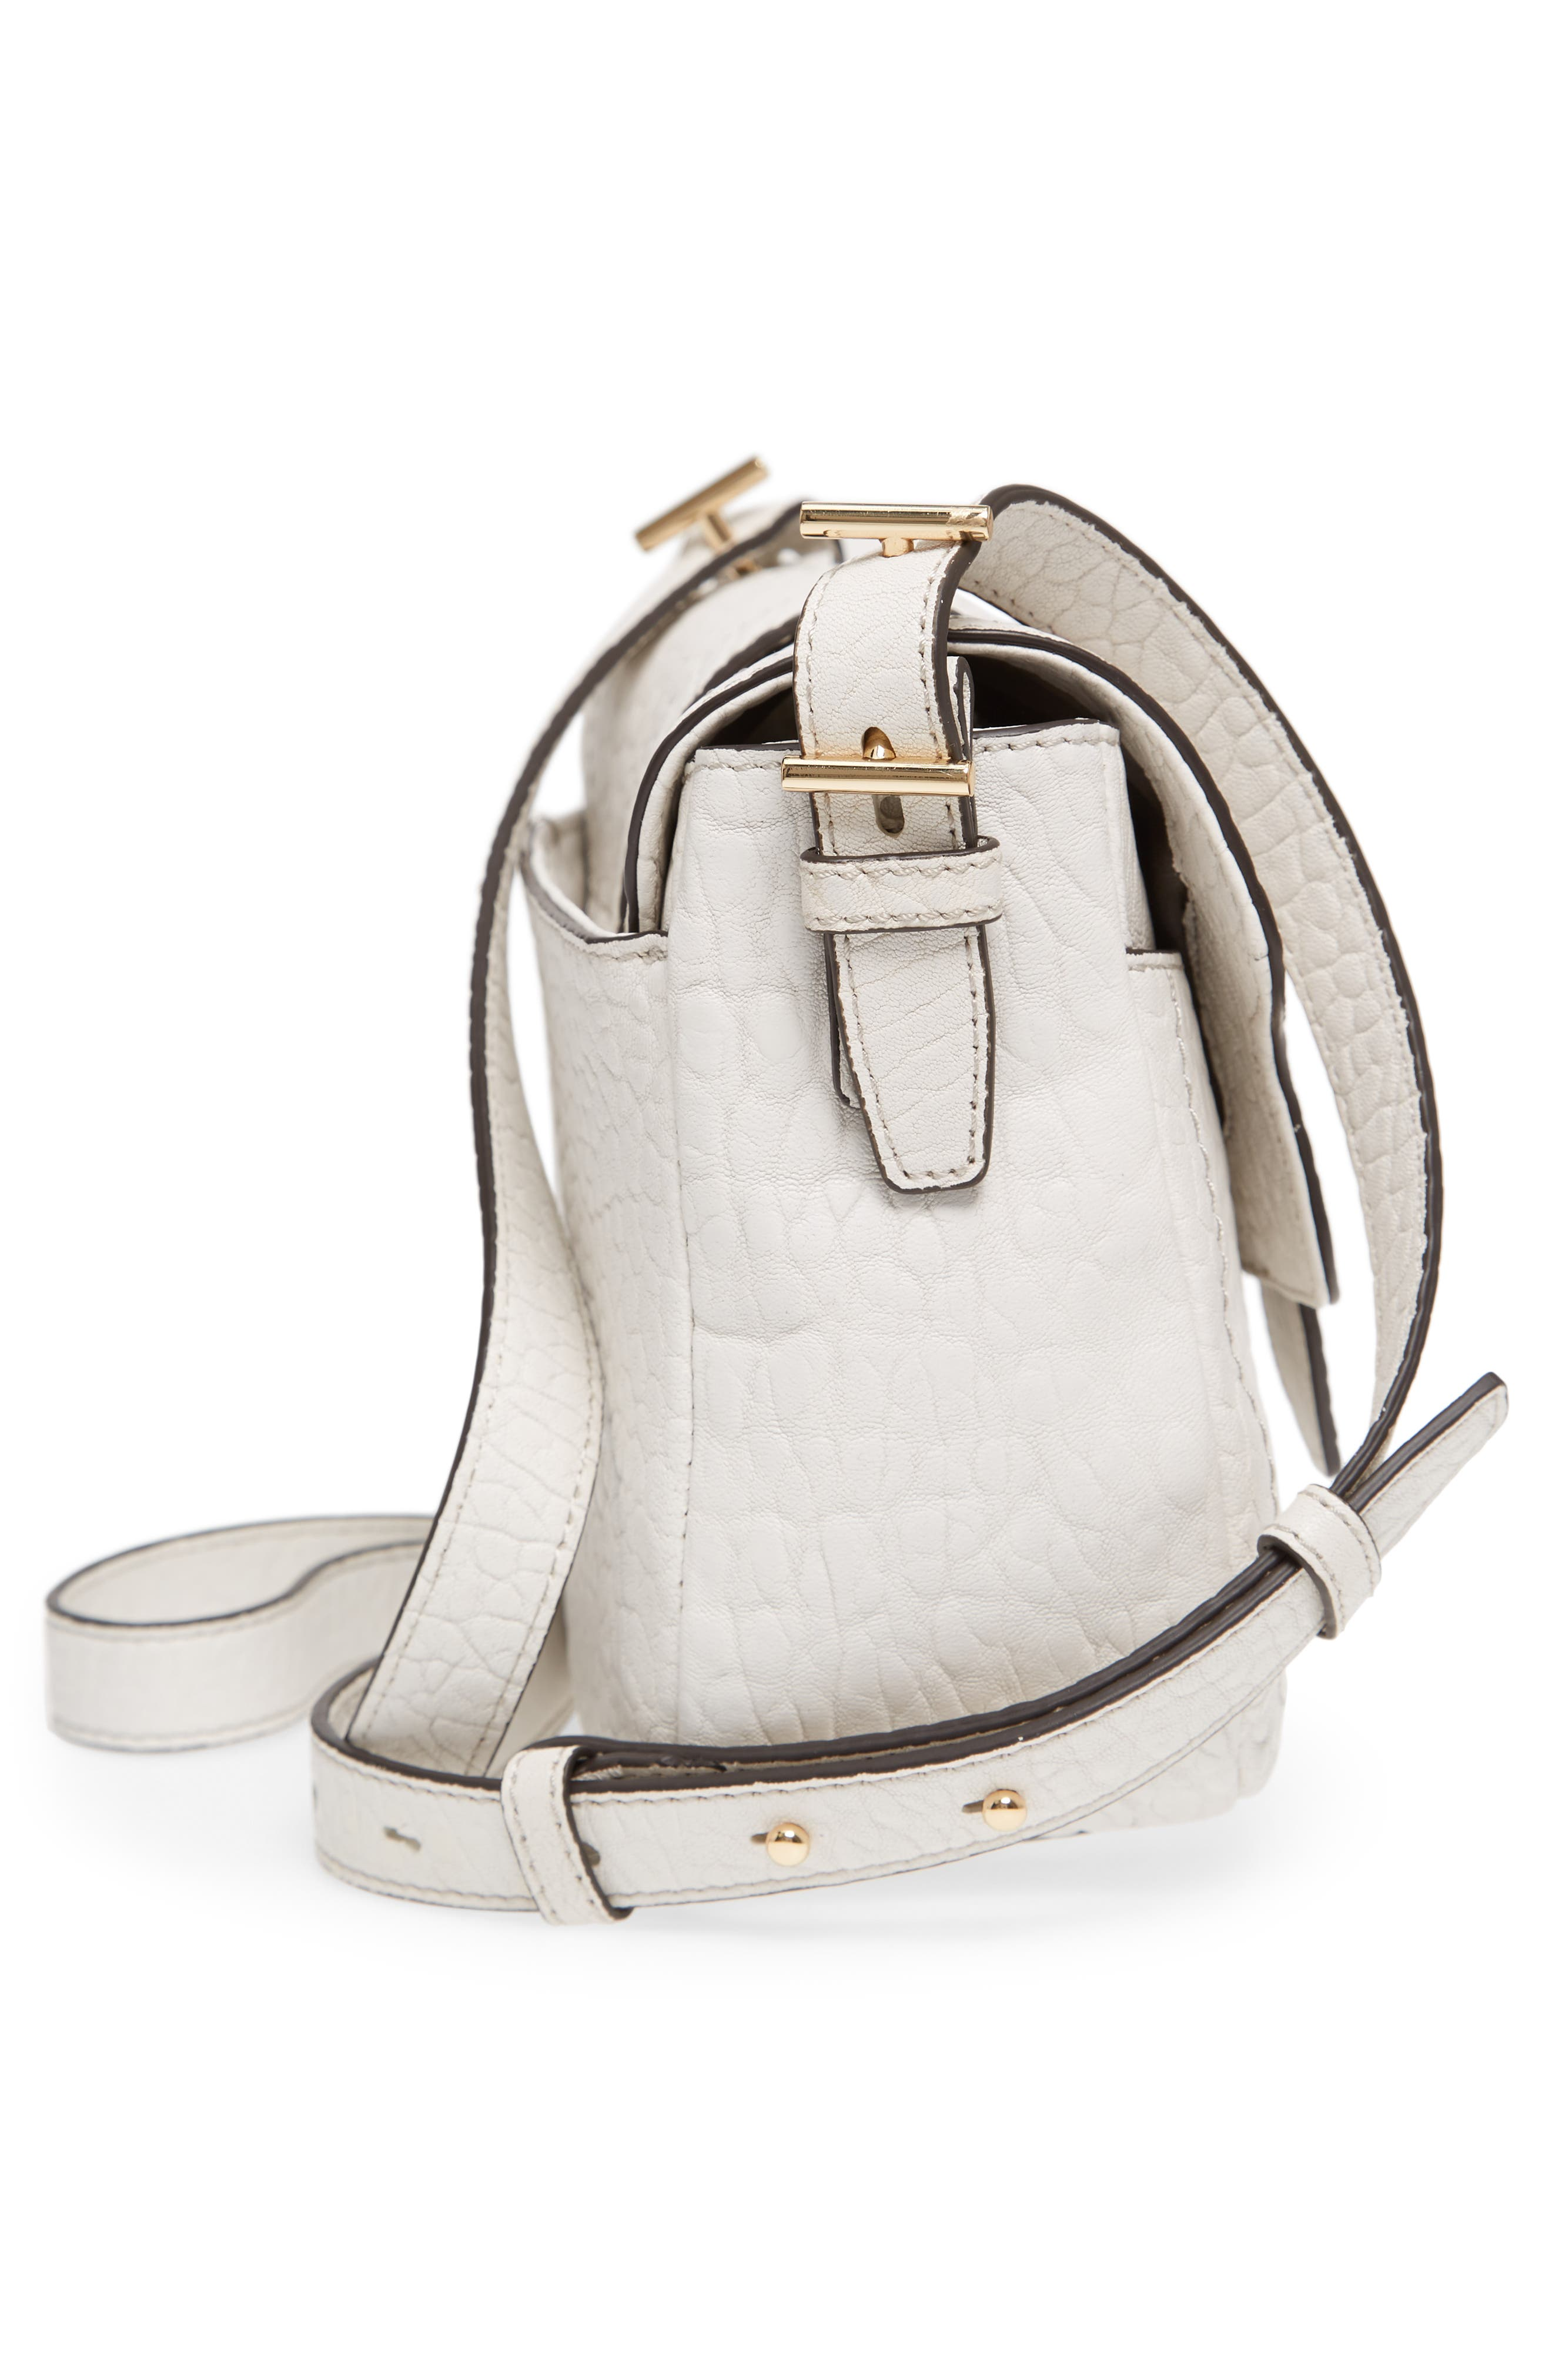 Fava Leather Crossbody Bag,                             Alternate thumbnail 5, color,                             Vaporous Grey